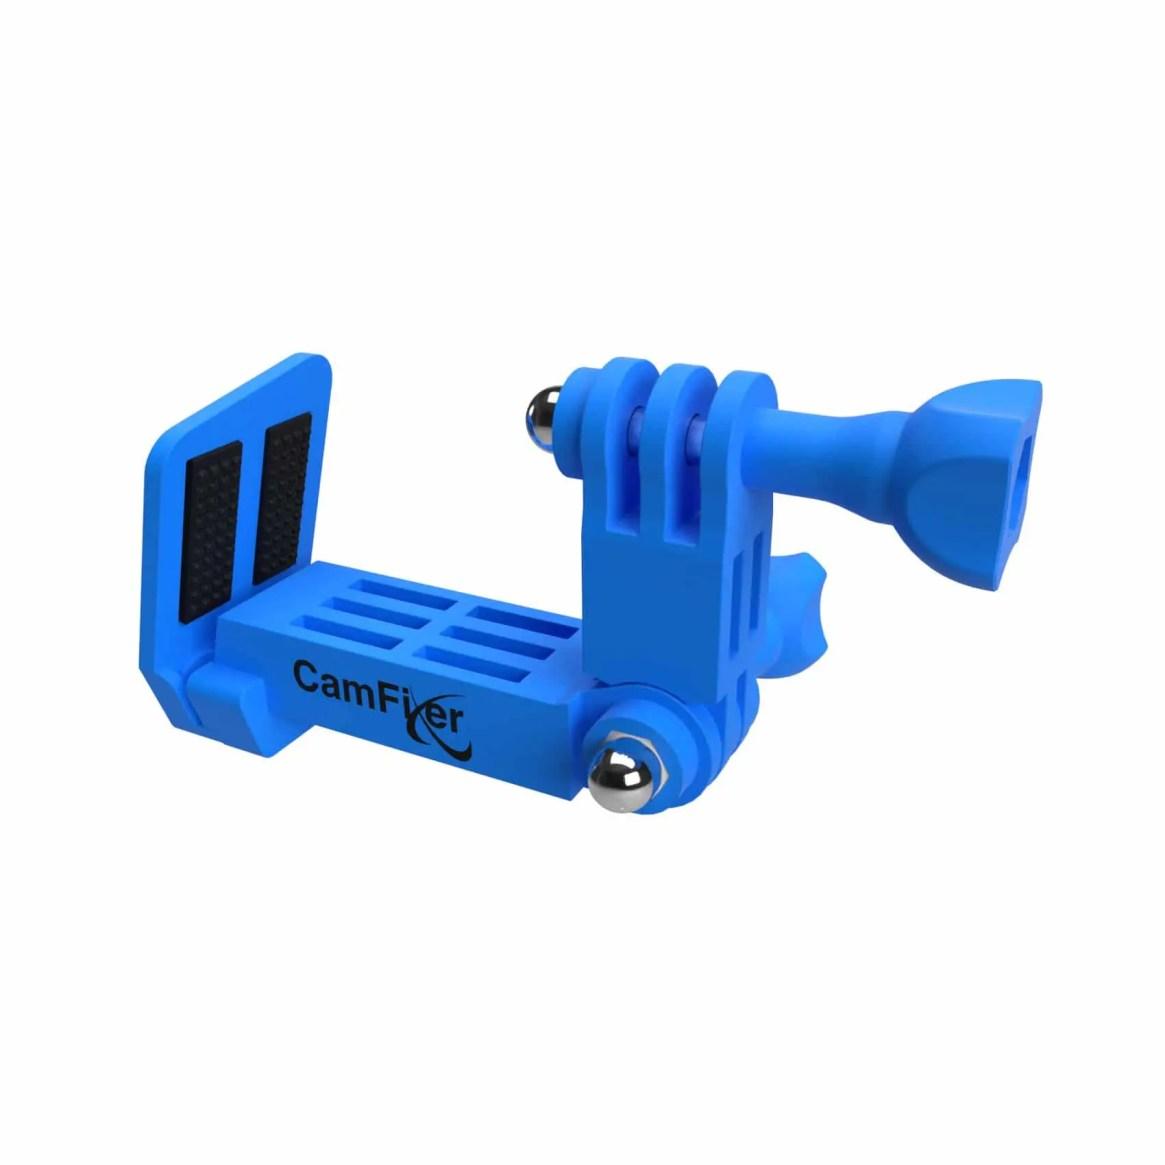 GoPro Blue